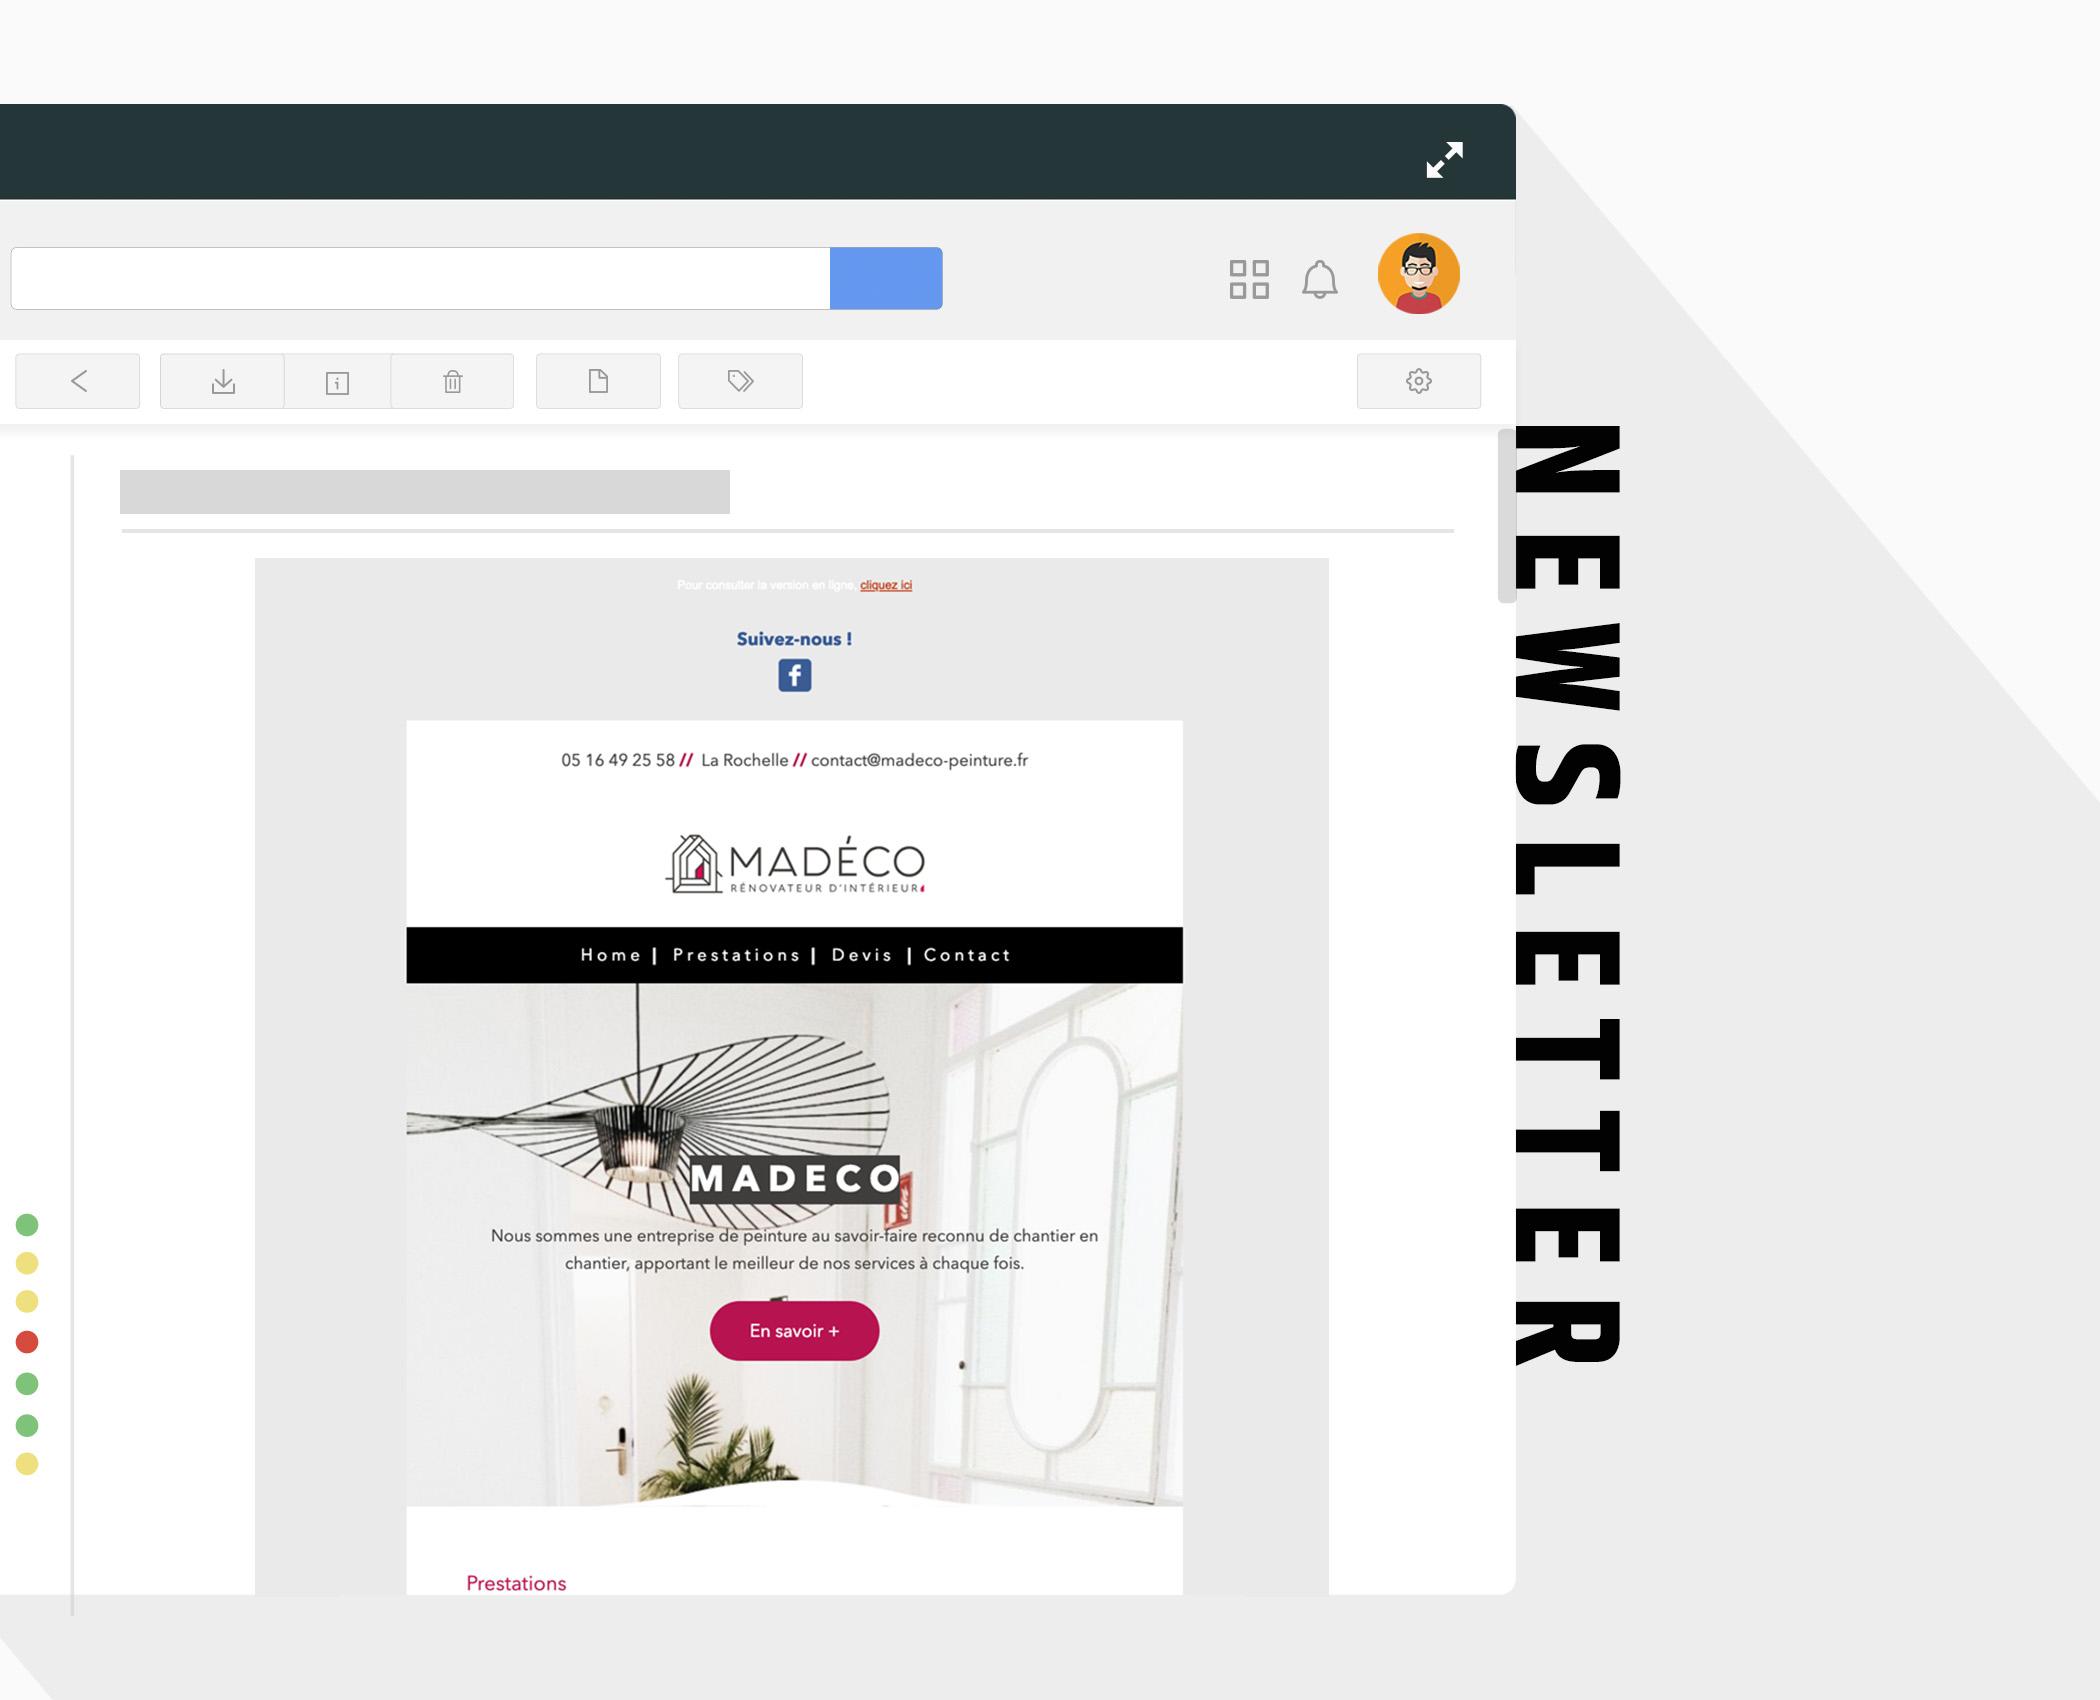 projet-newsletter-madeco-peinture-web-Design-newsletter-Julia-Capdebos-2.jpg